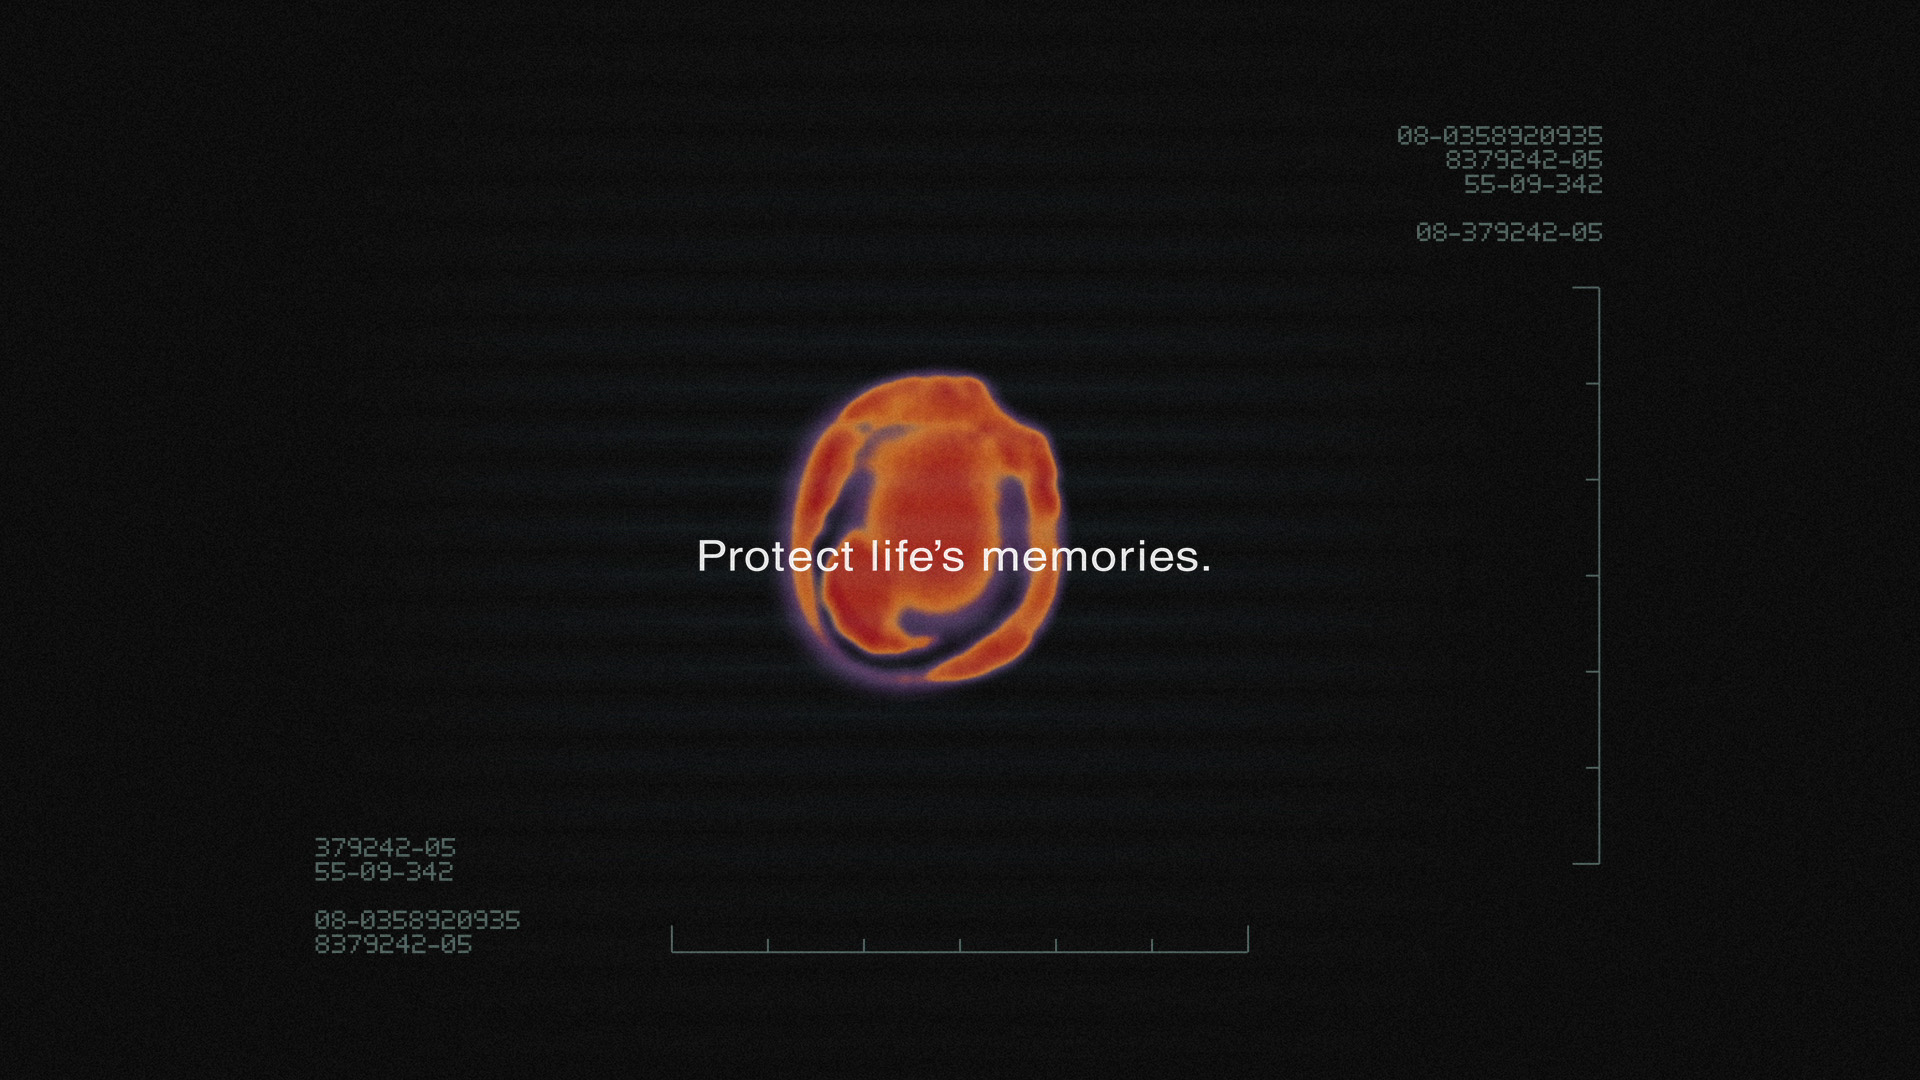 alzheimers_brainscan_image05